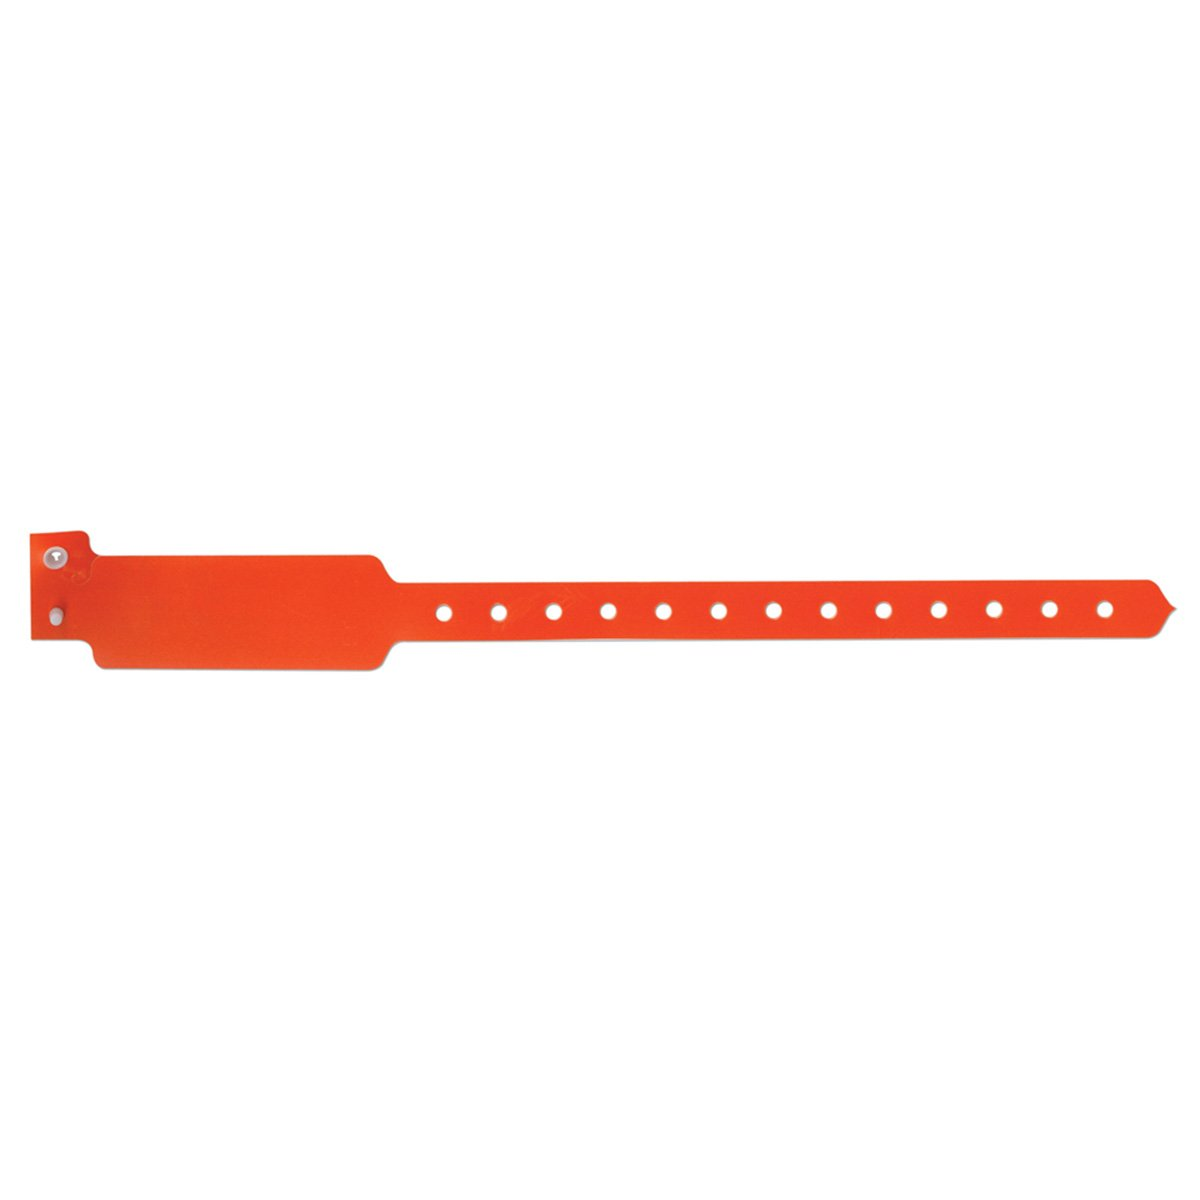 Sentry 5070-17-PDM Write-On Wristband, Poly Clasp Closure, 1'' x 10'', Pediatric, Orange (Pack of 500)